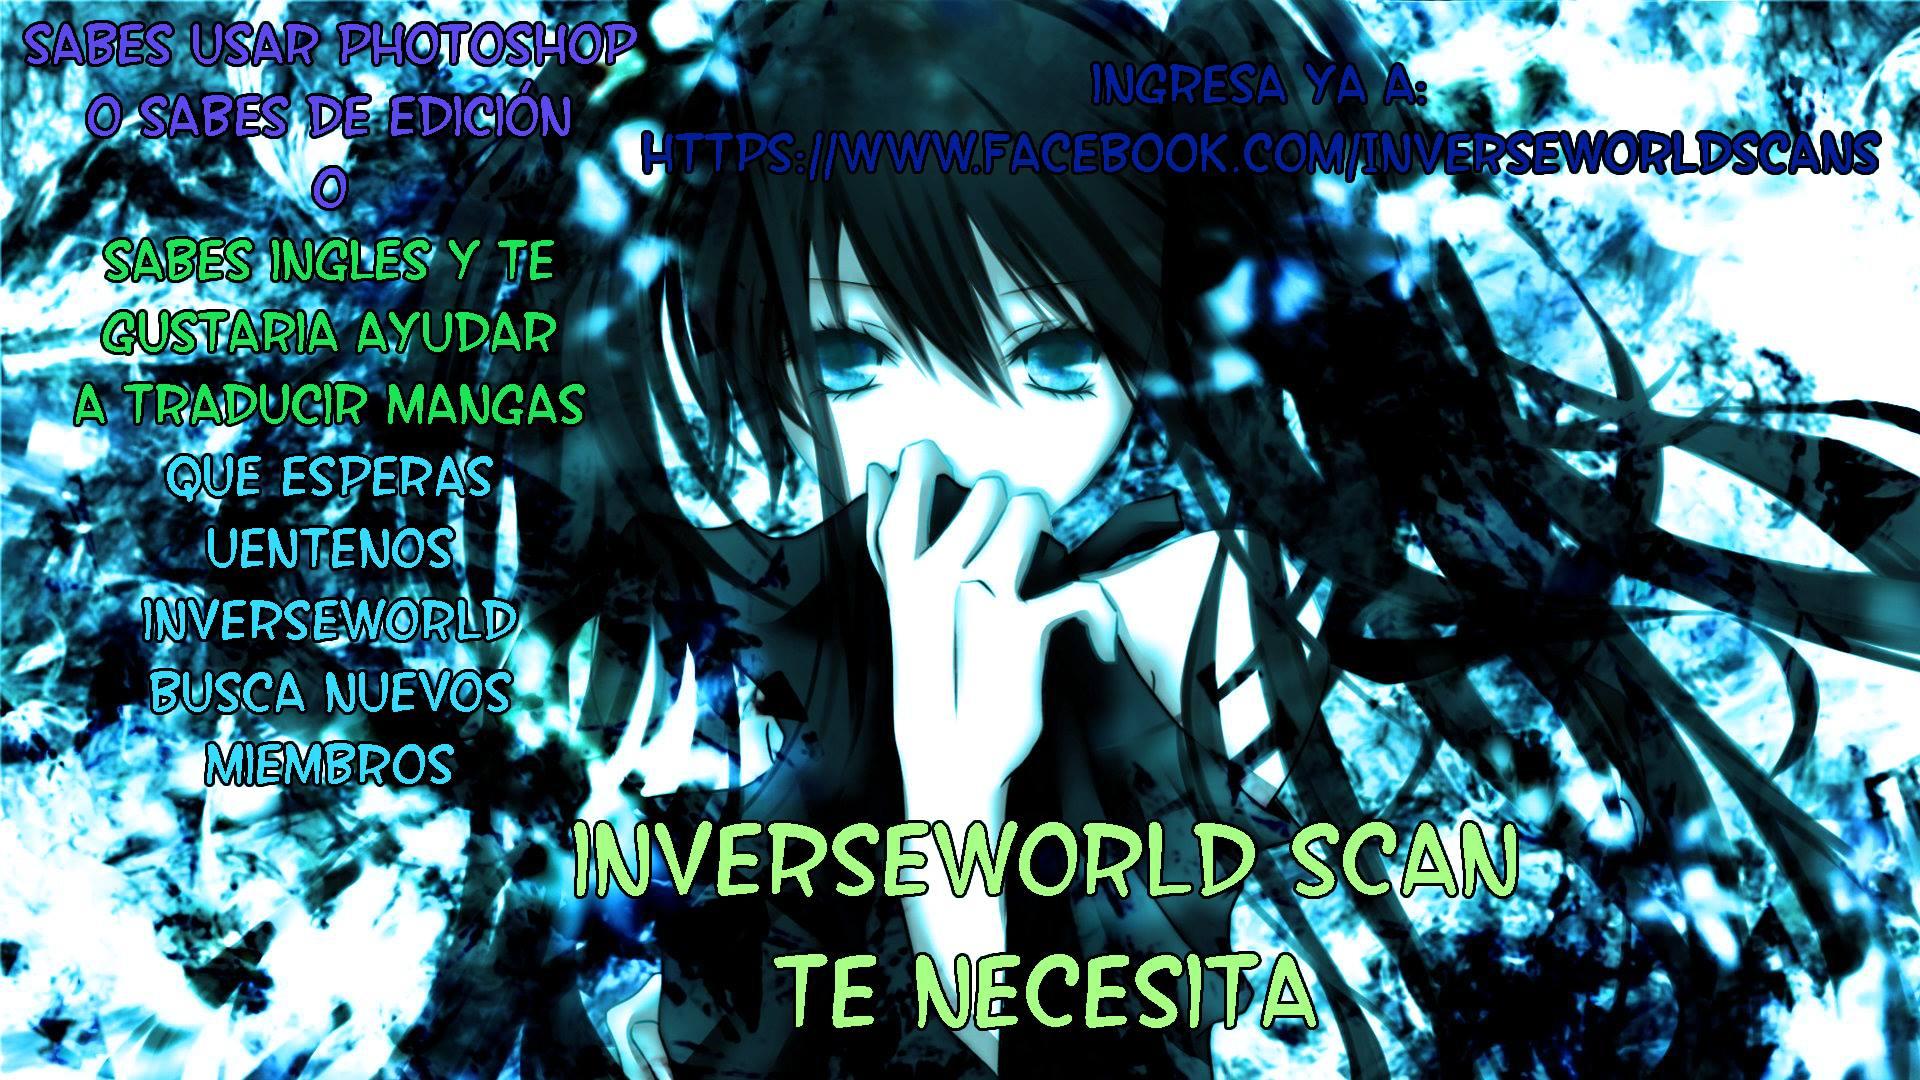 https://c5.mangatag.com/es_manga/18/16210/415306/d7624597aee42bffe1185d214d50feed.jpg Page 1